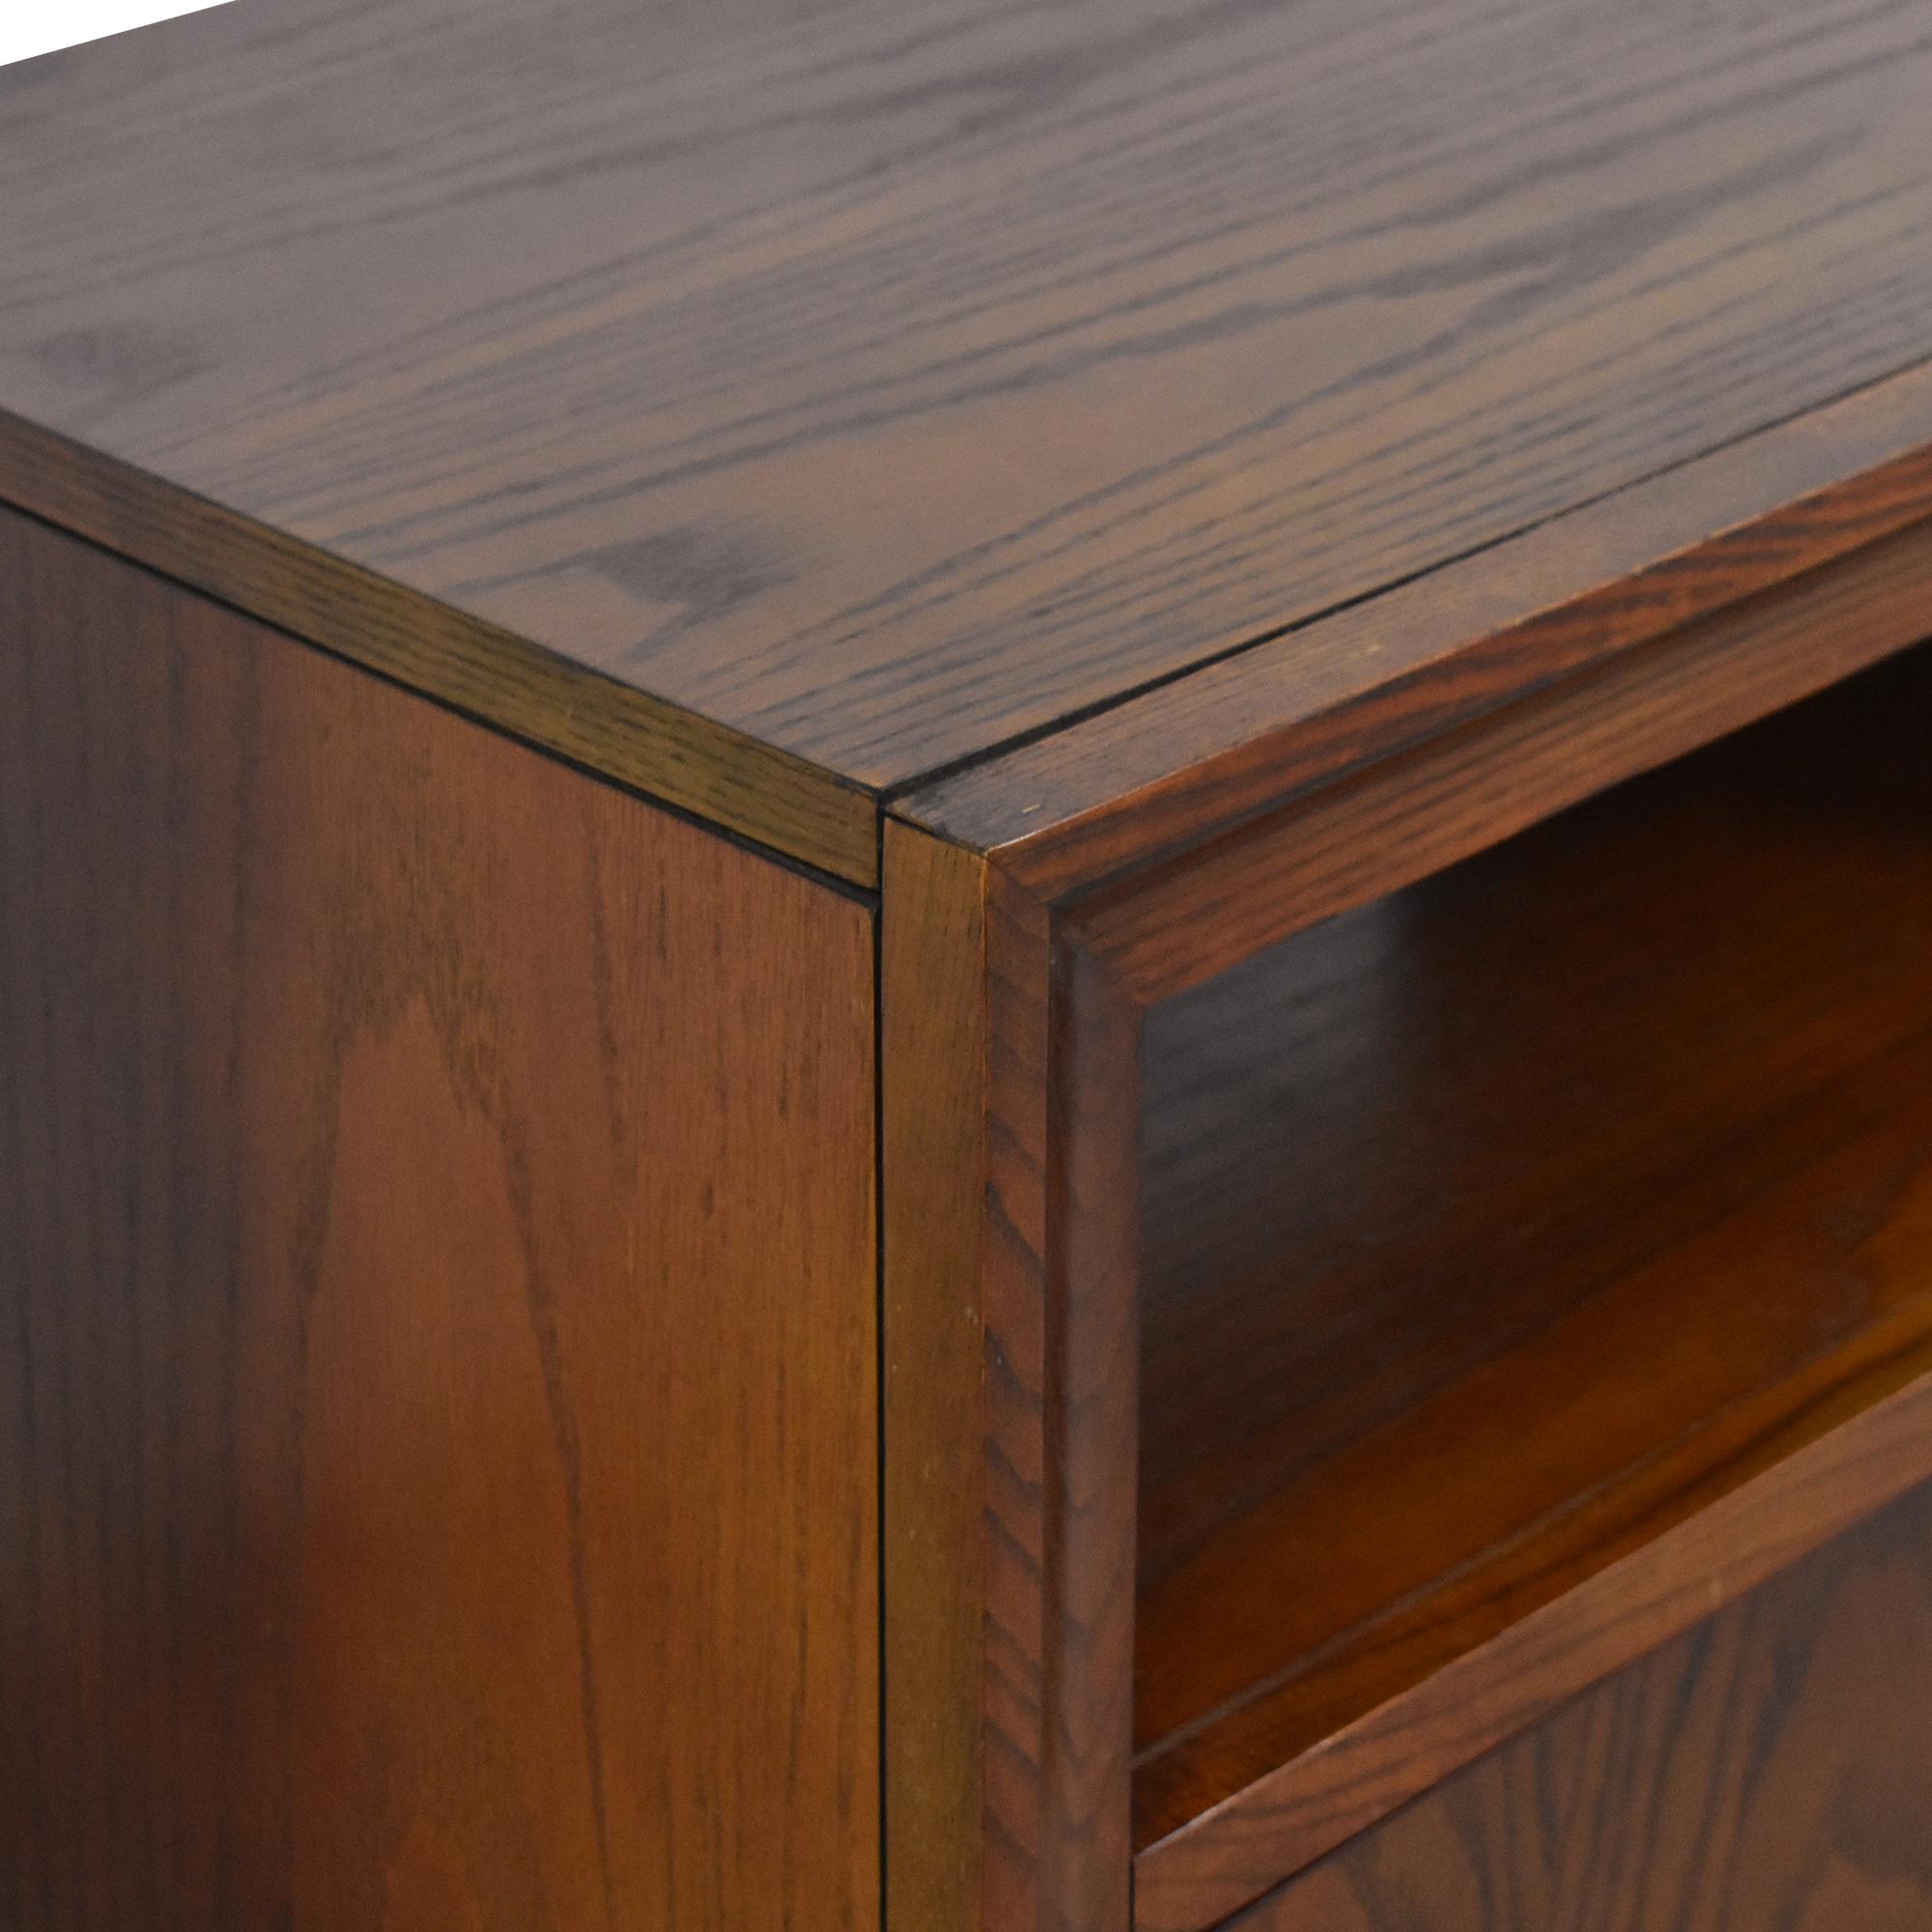 Crate & Barrel Two Door Sideboard / Cabinets & Sideboards